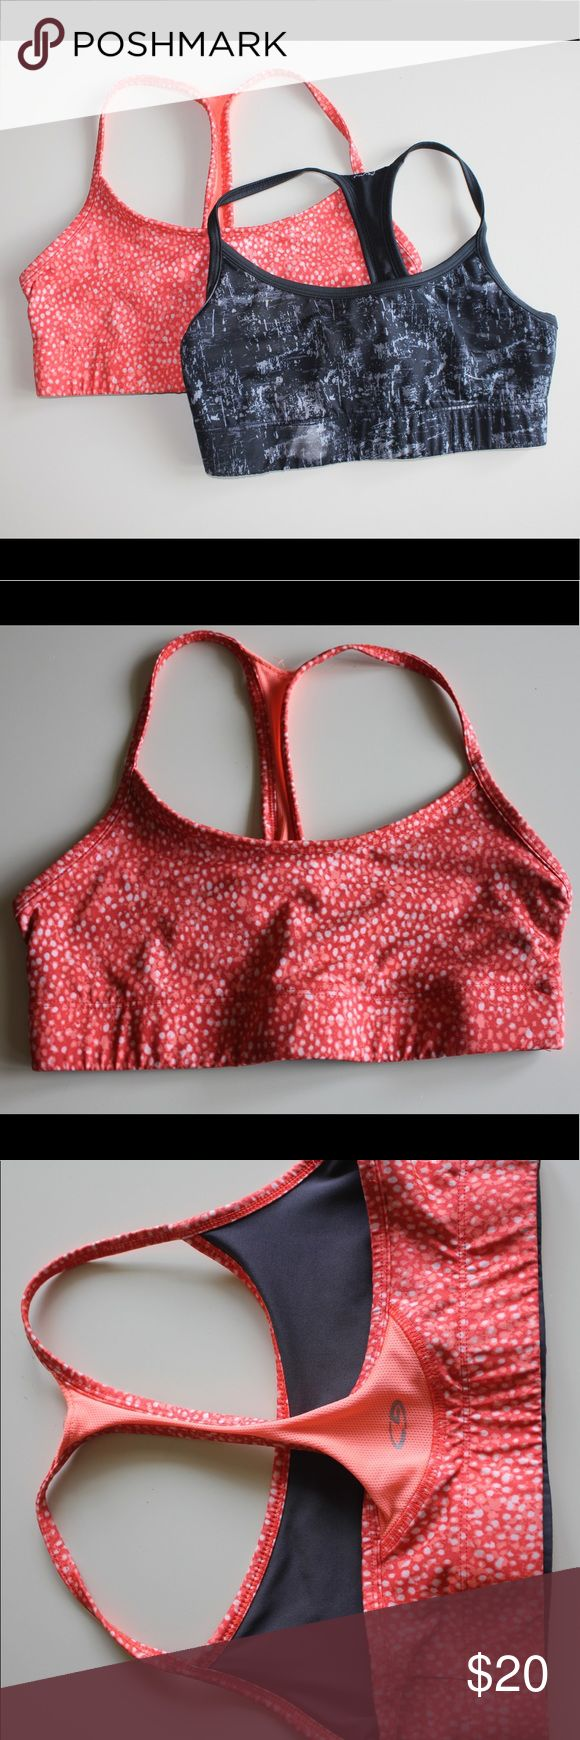 CHAMPION sports bra bundle!!! orange and black patterned sports bra. black is reversible! Champion Intimates & Sleepwear Bras